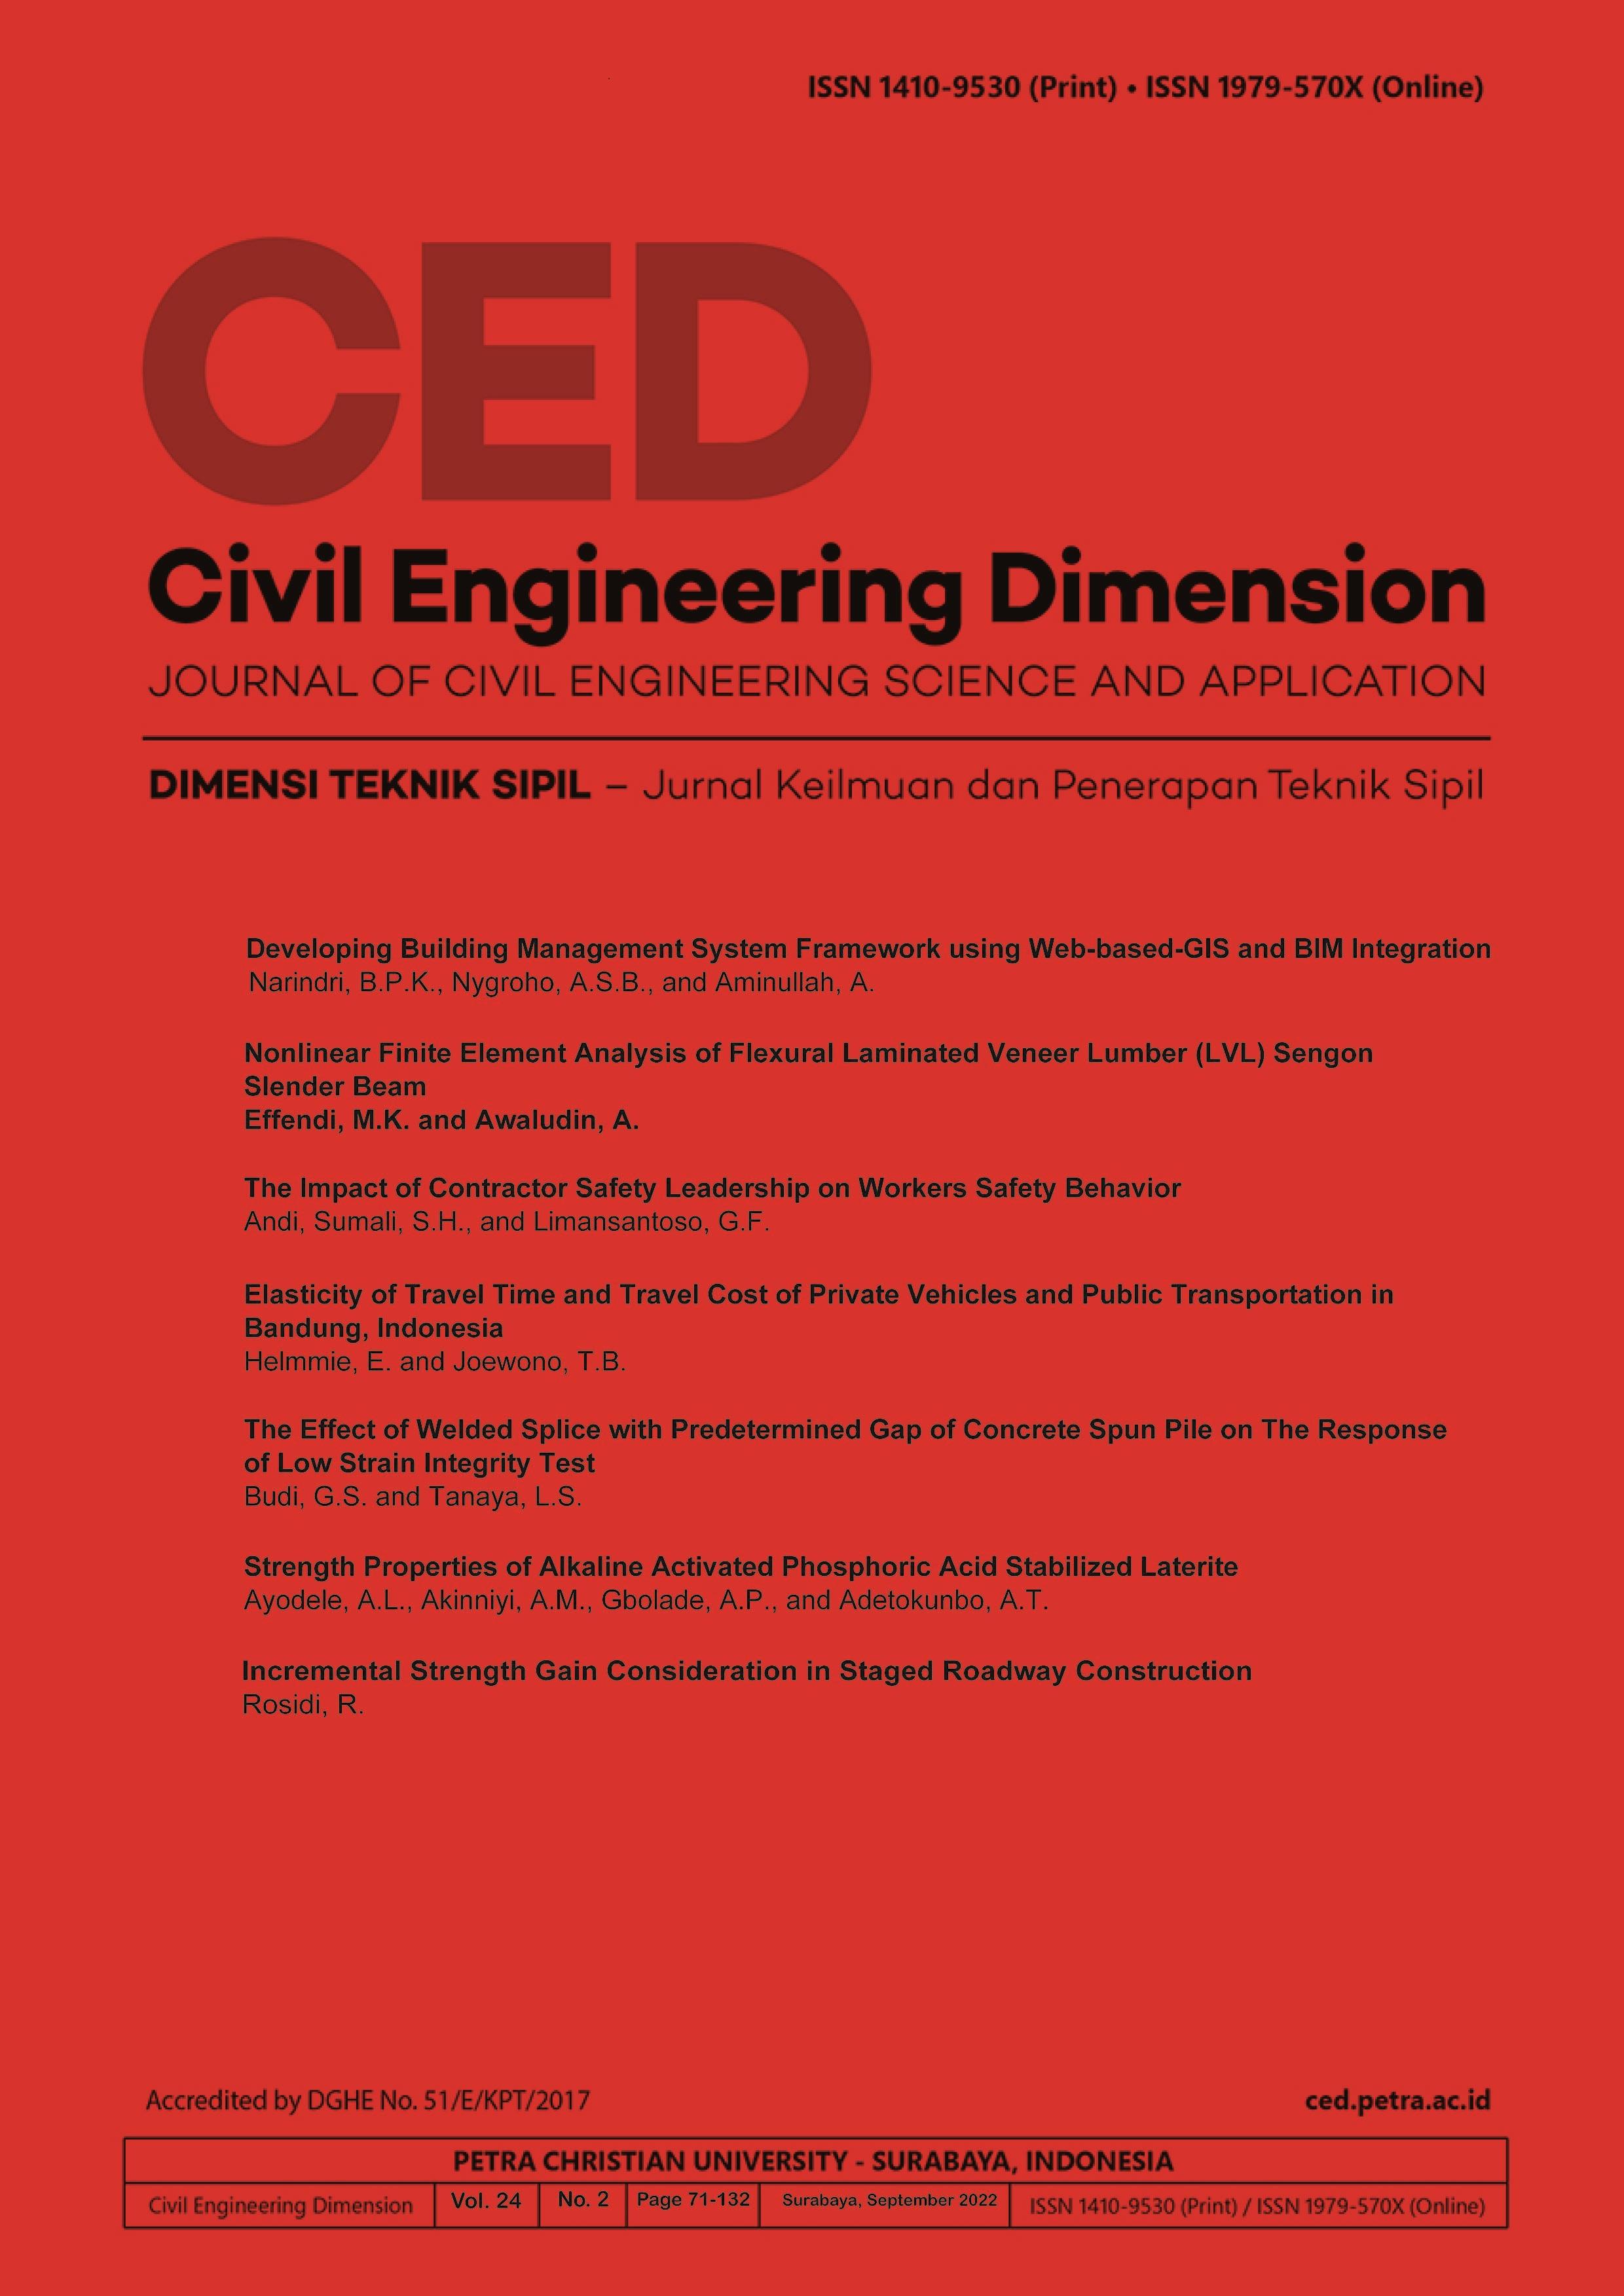 Civil Engineering Dimension